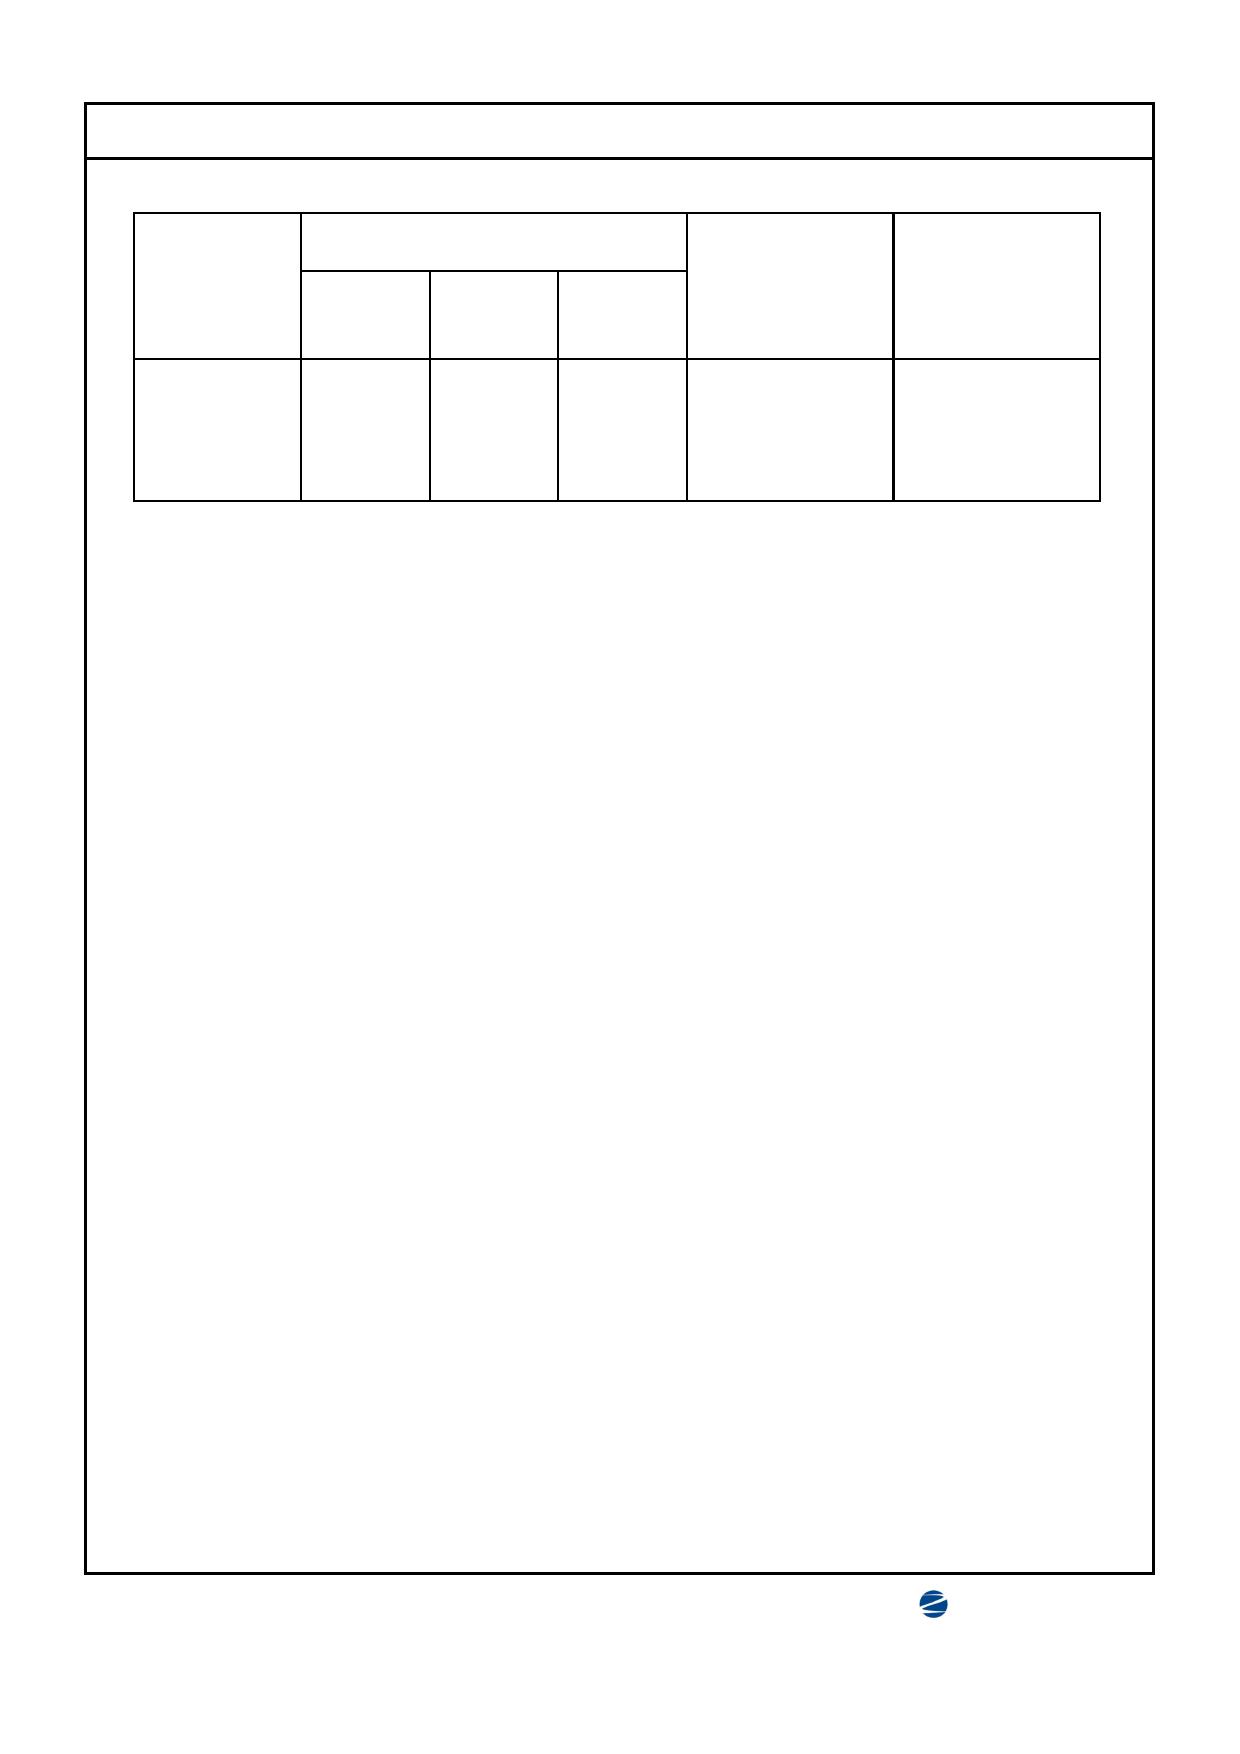 MBR30150CTSH pdf, ピン配列